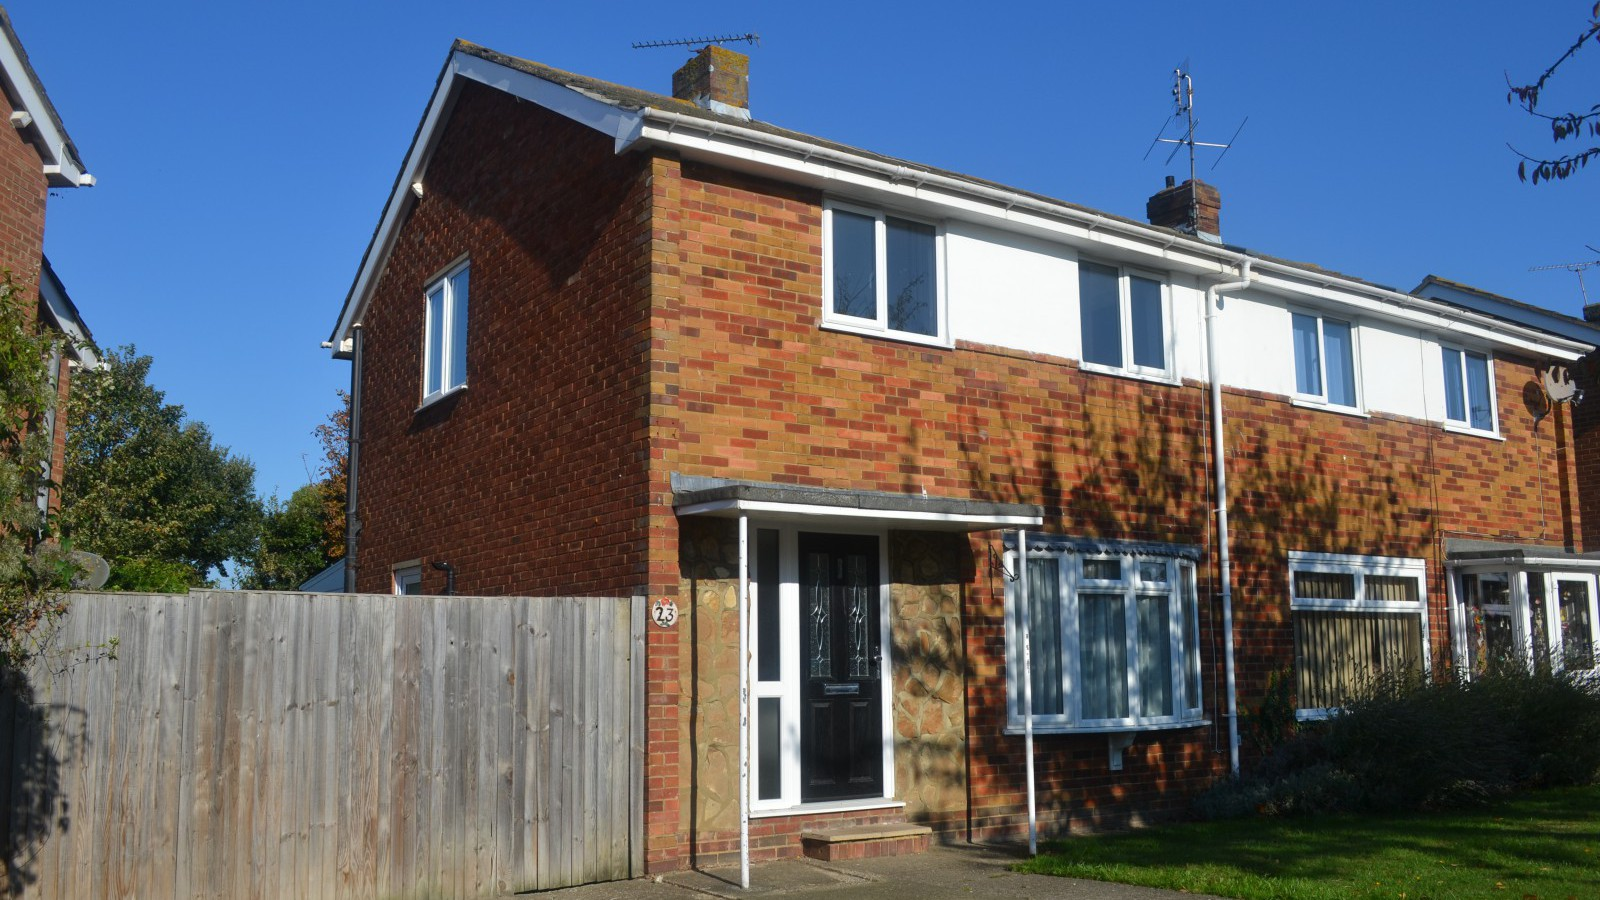 Millstream Close, Whitstable, Kent